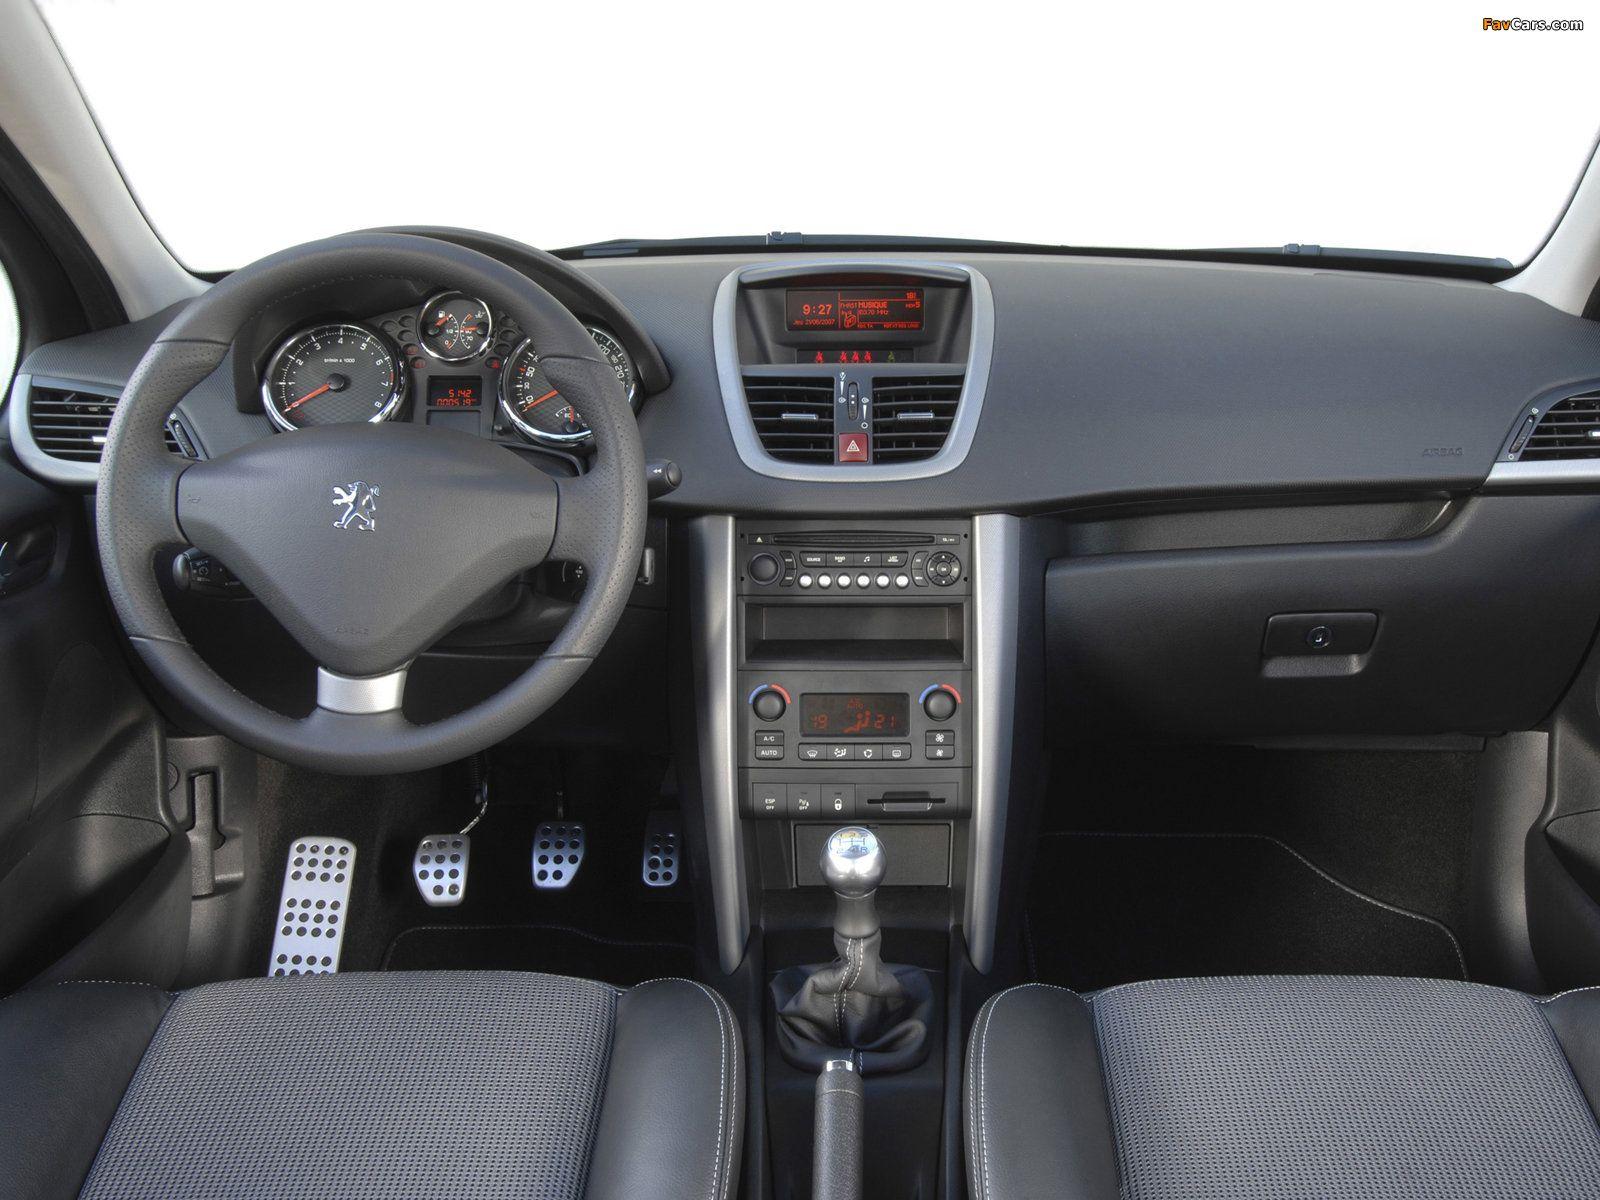 Peugeot 207 Rc Sw 2008 09